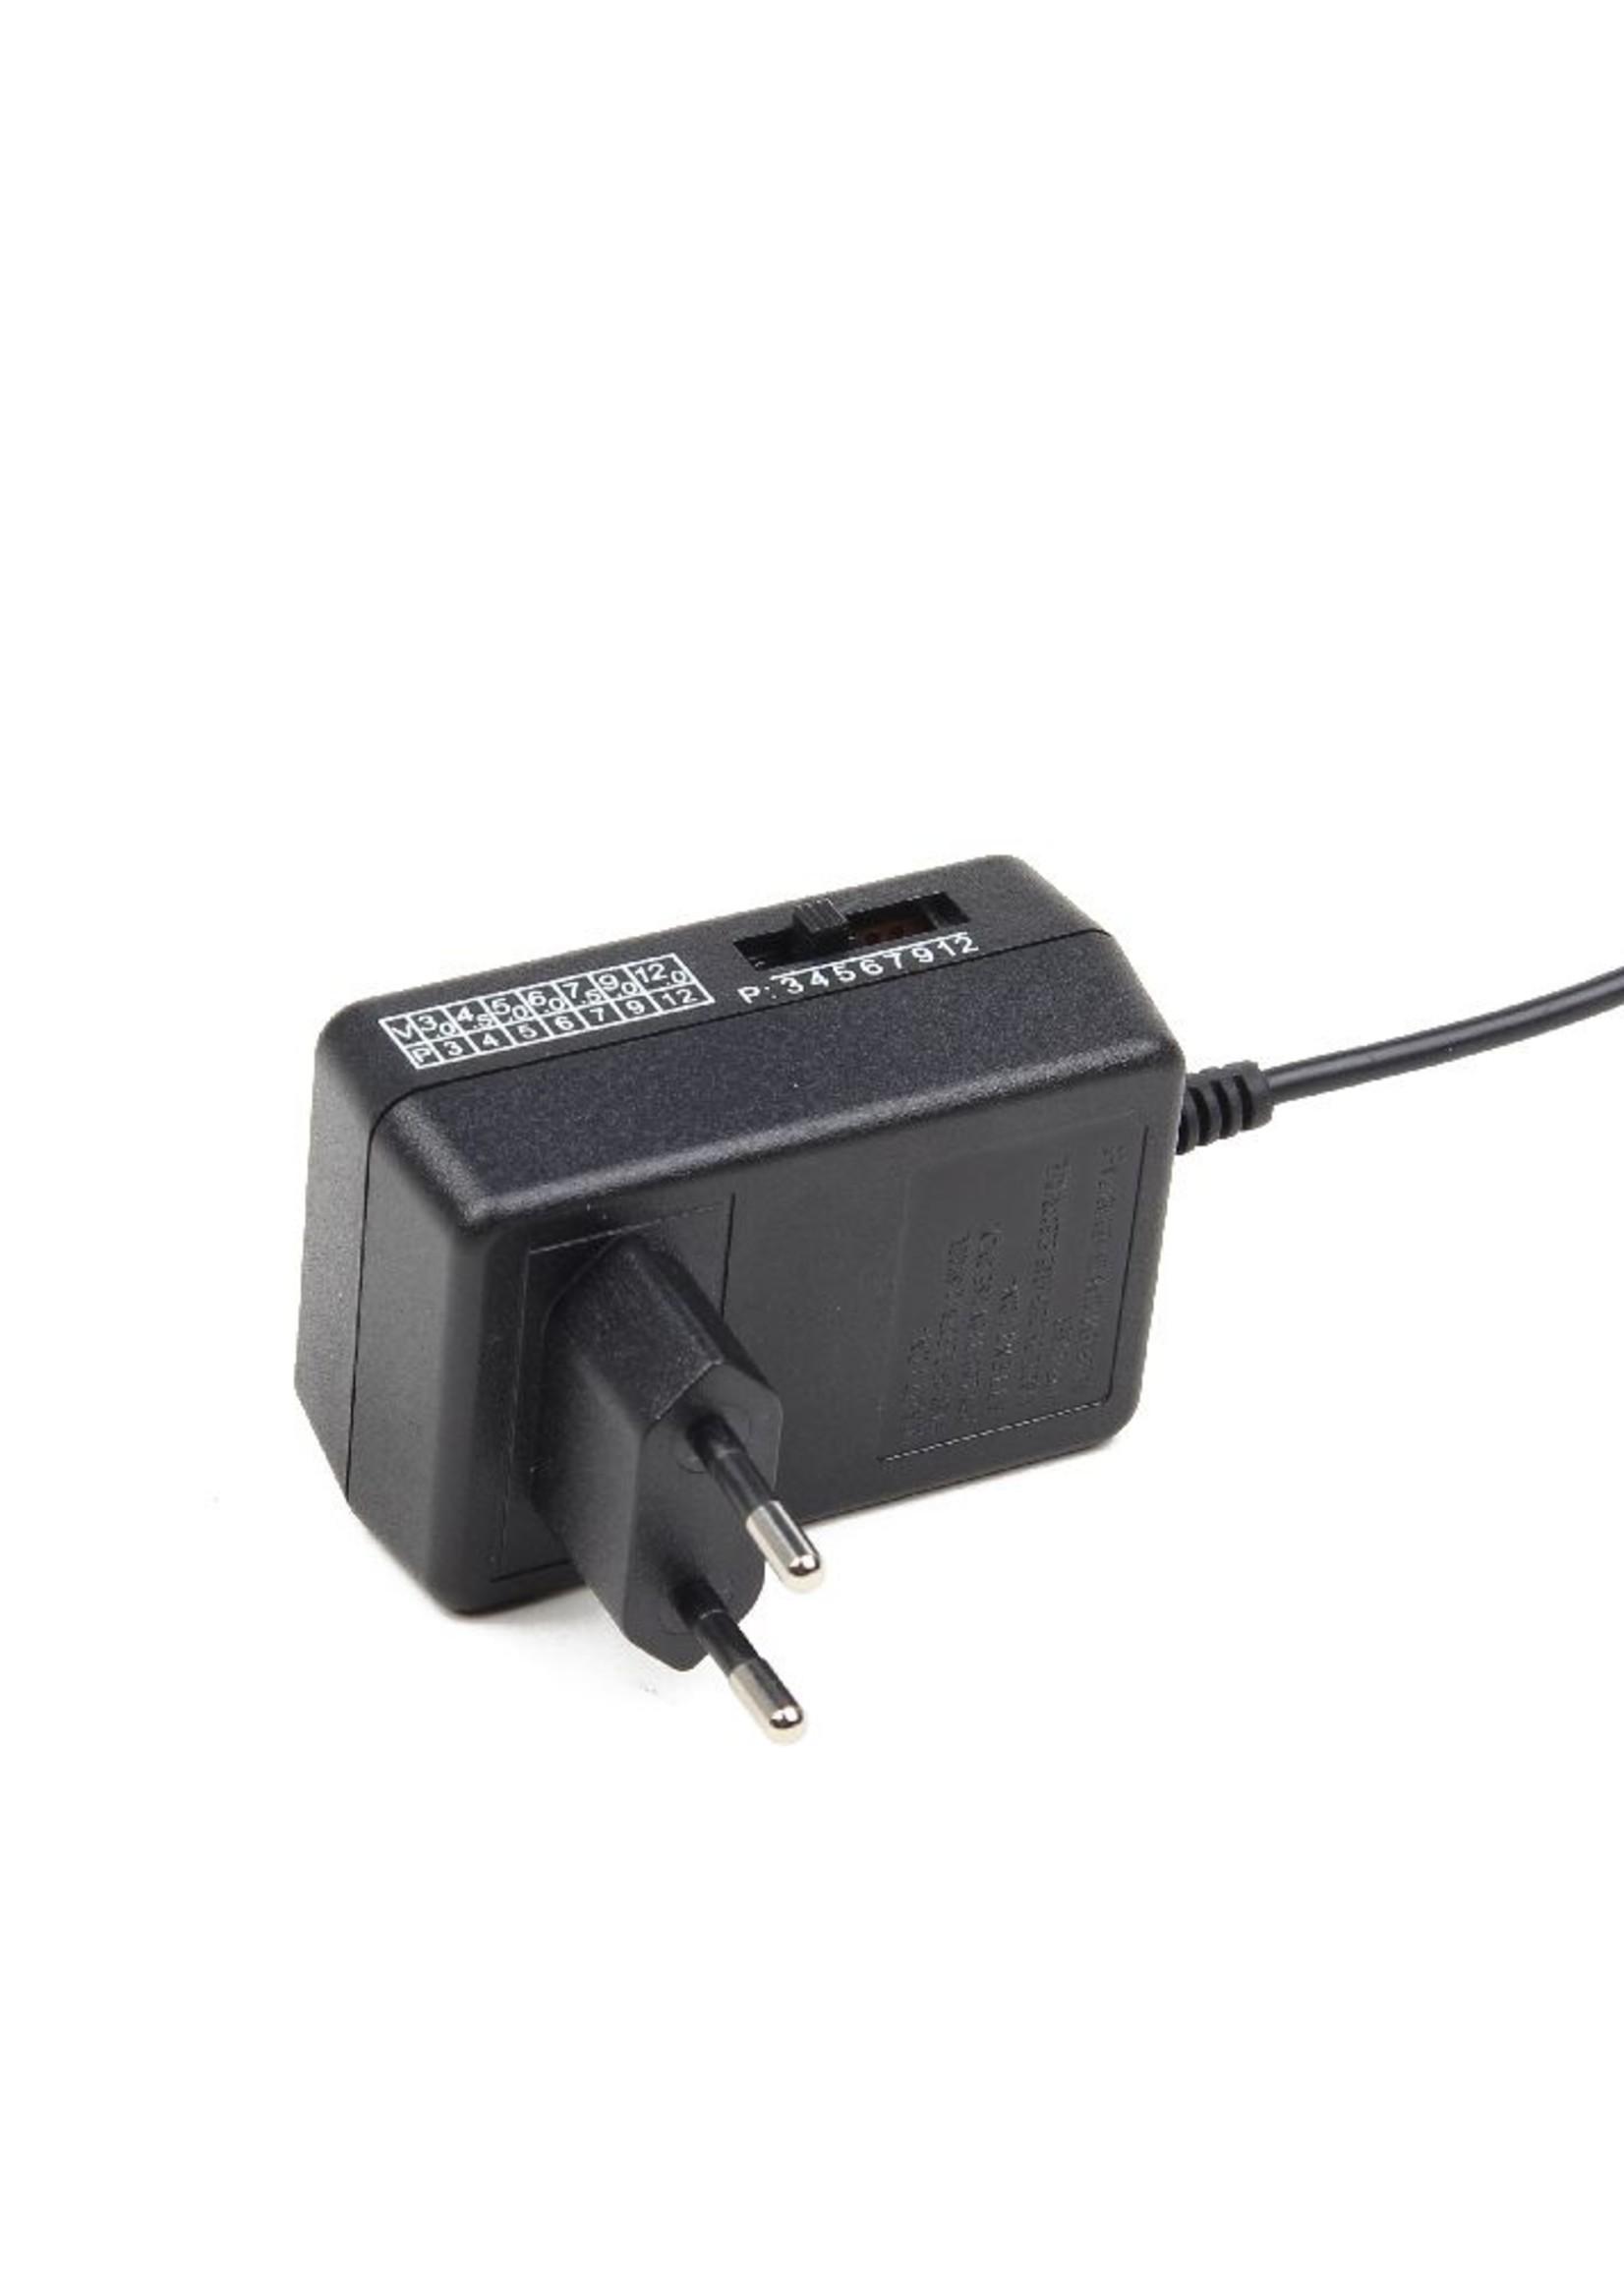 EnerGenie Universele AC/DC adapter, 12 W